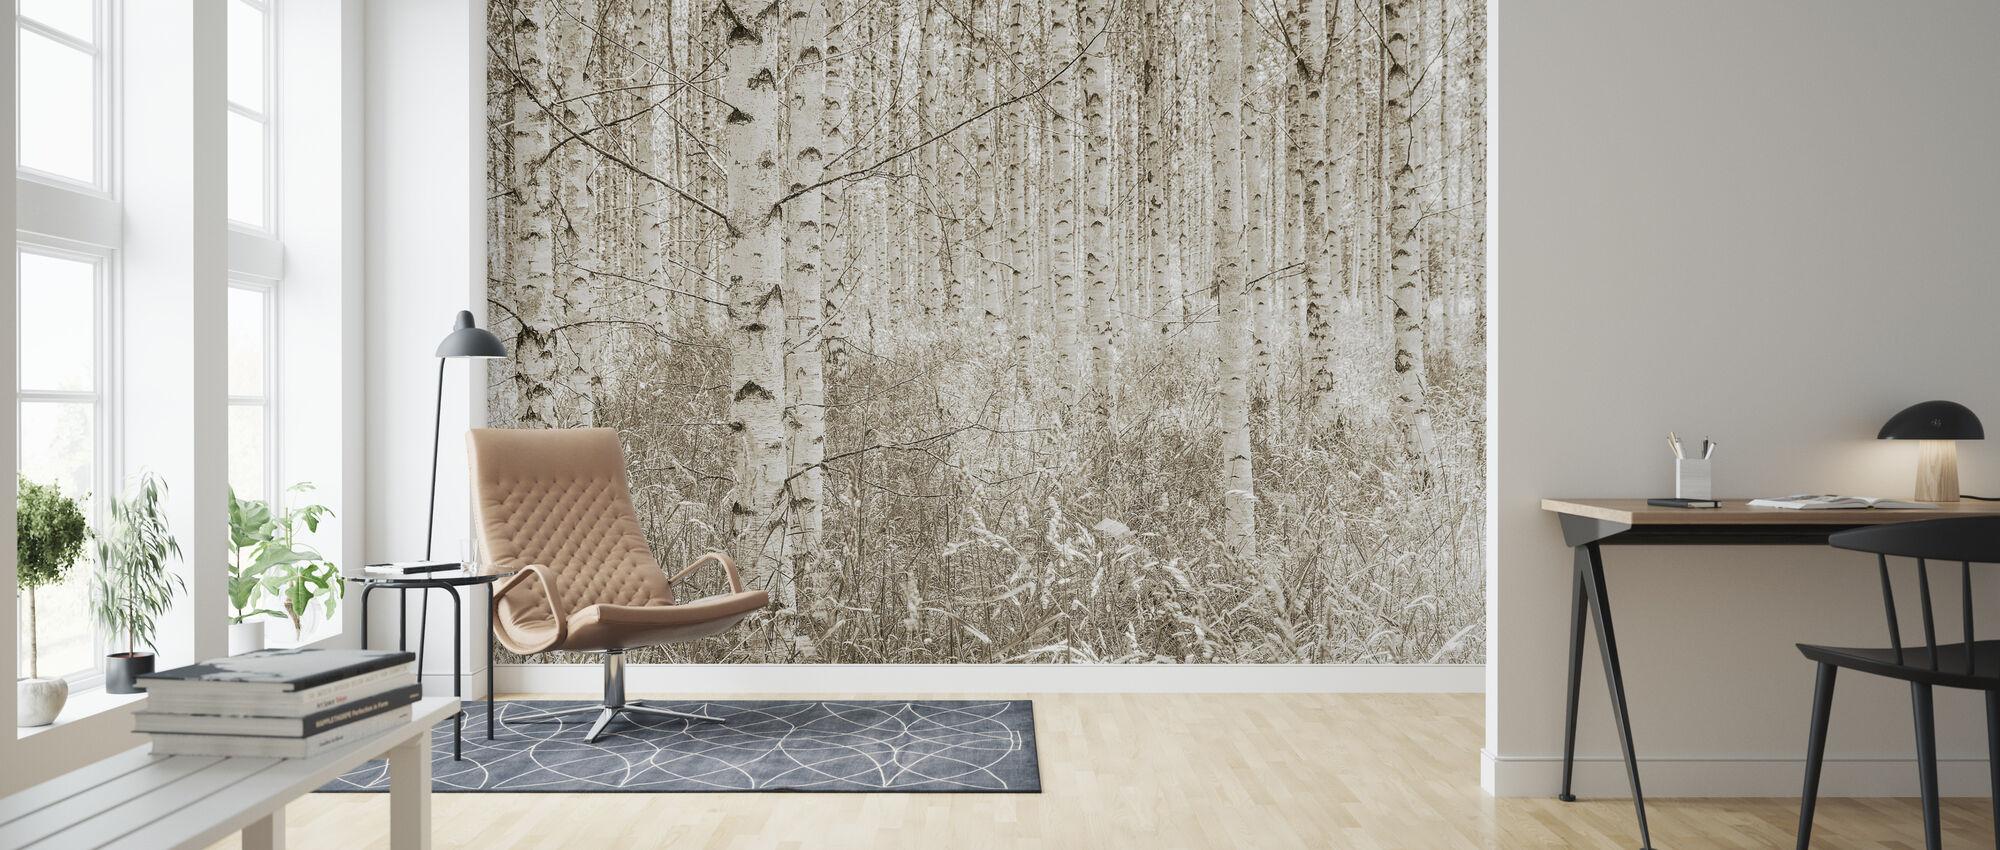 Quiet Birch Forest - Wallpaper - Living Room